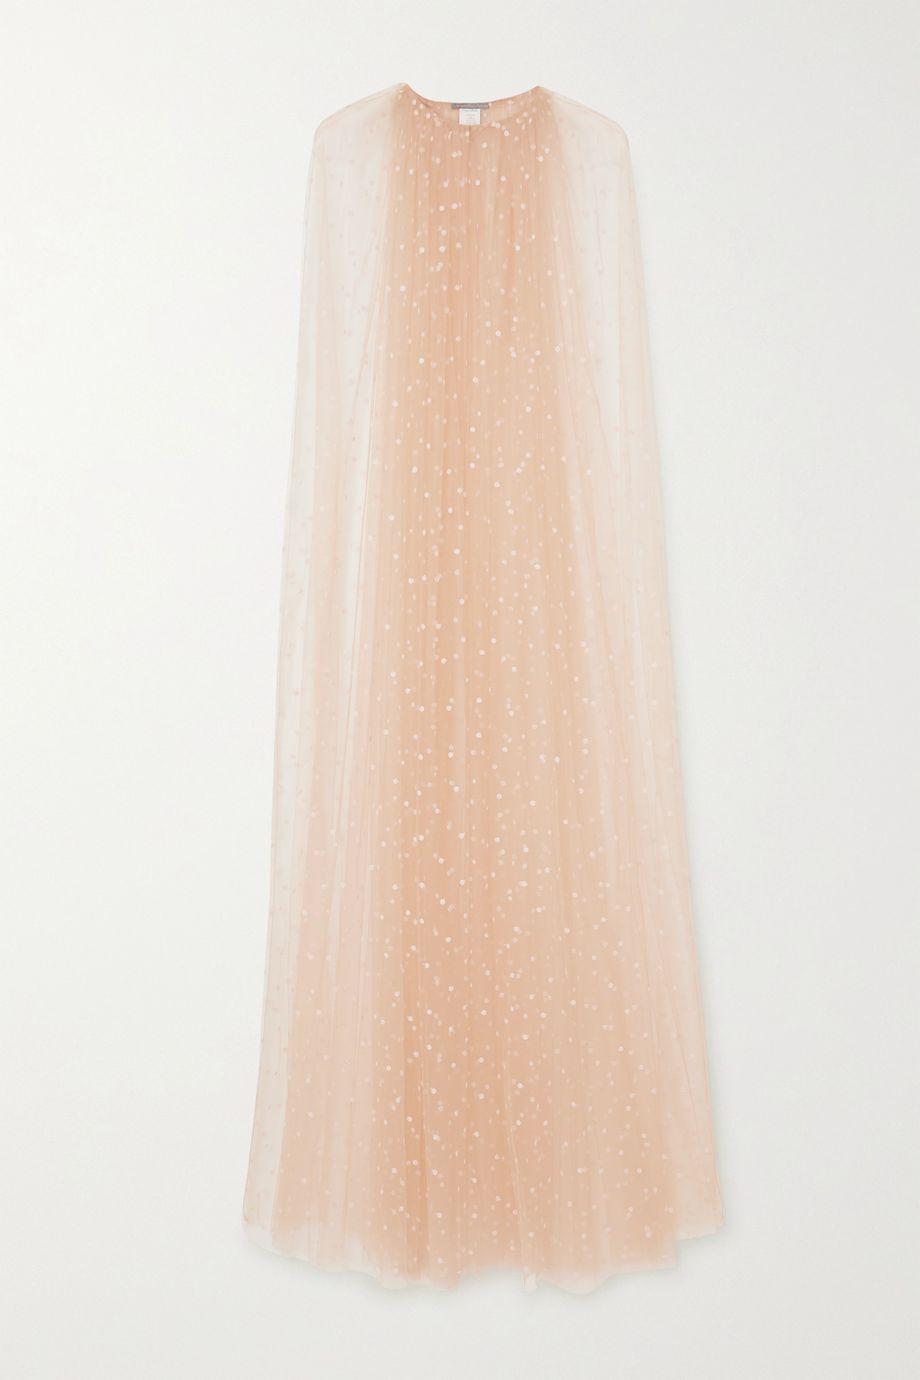 Monique Lhuillier Embroidered tulle cape